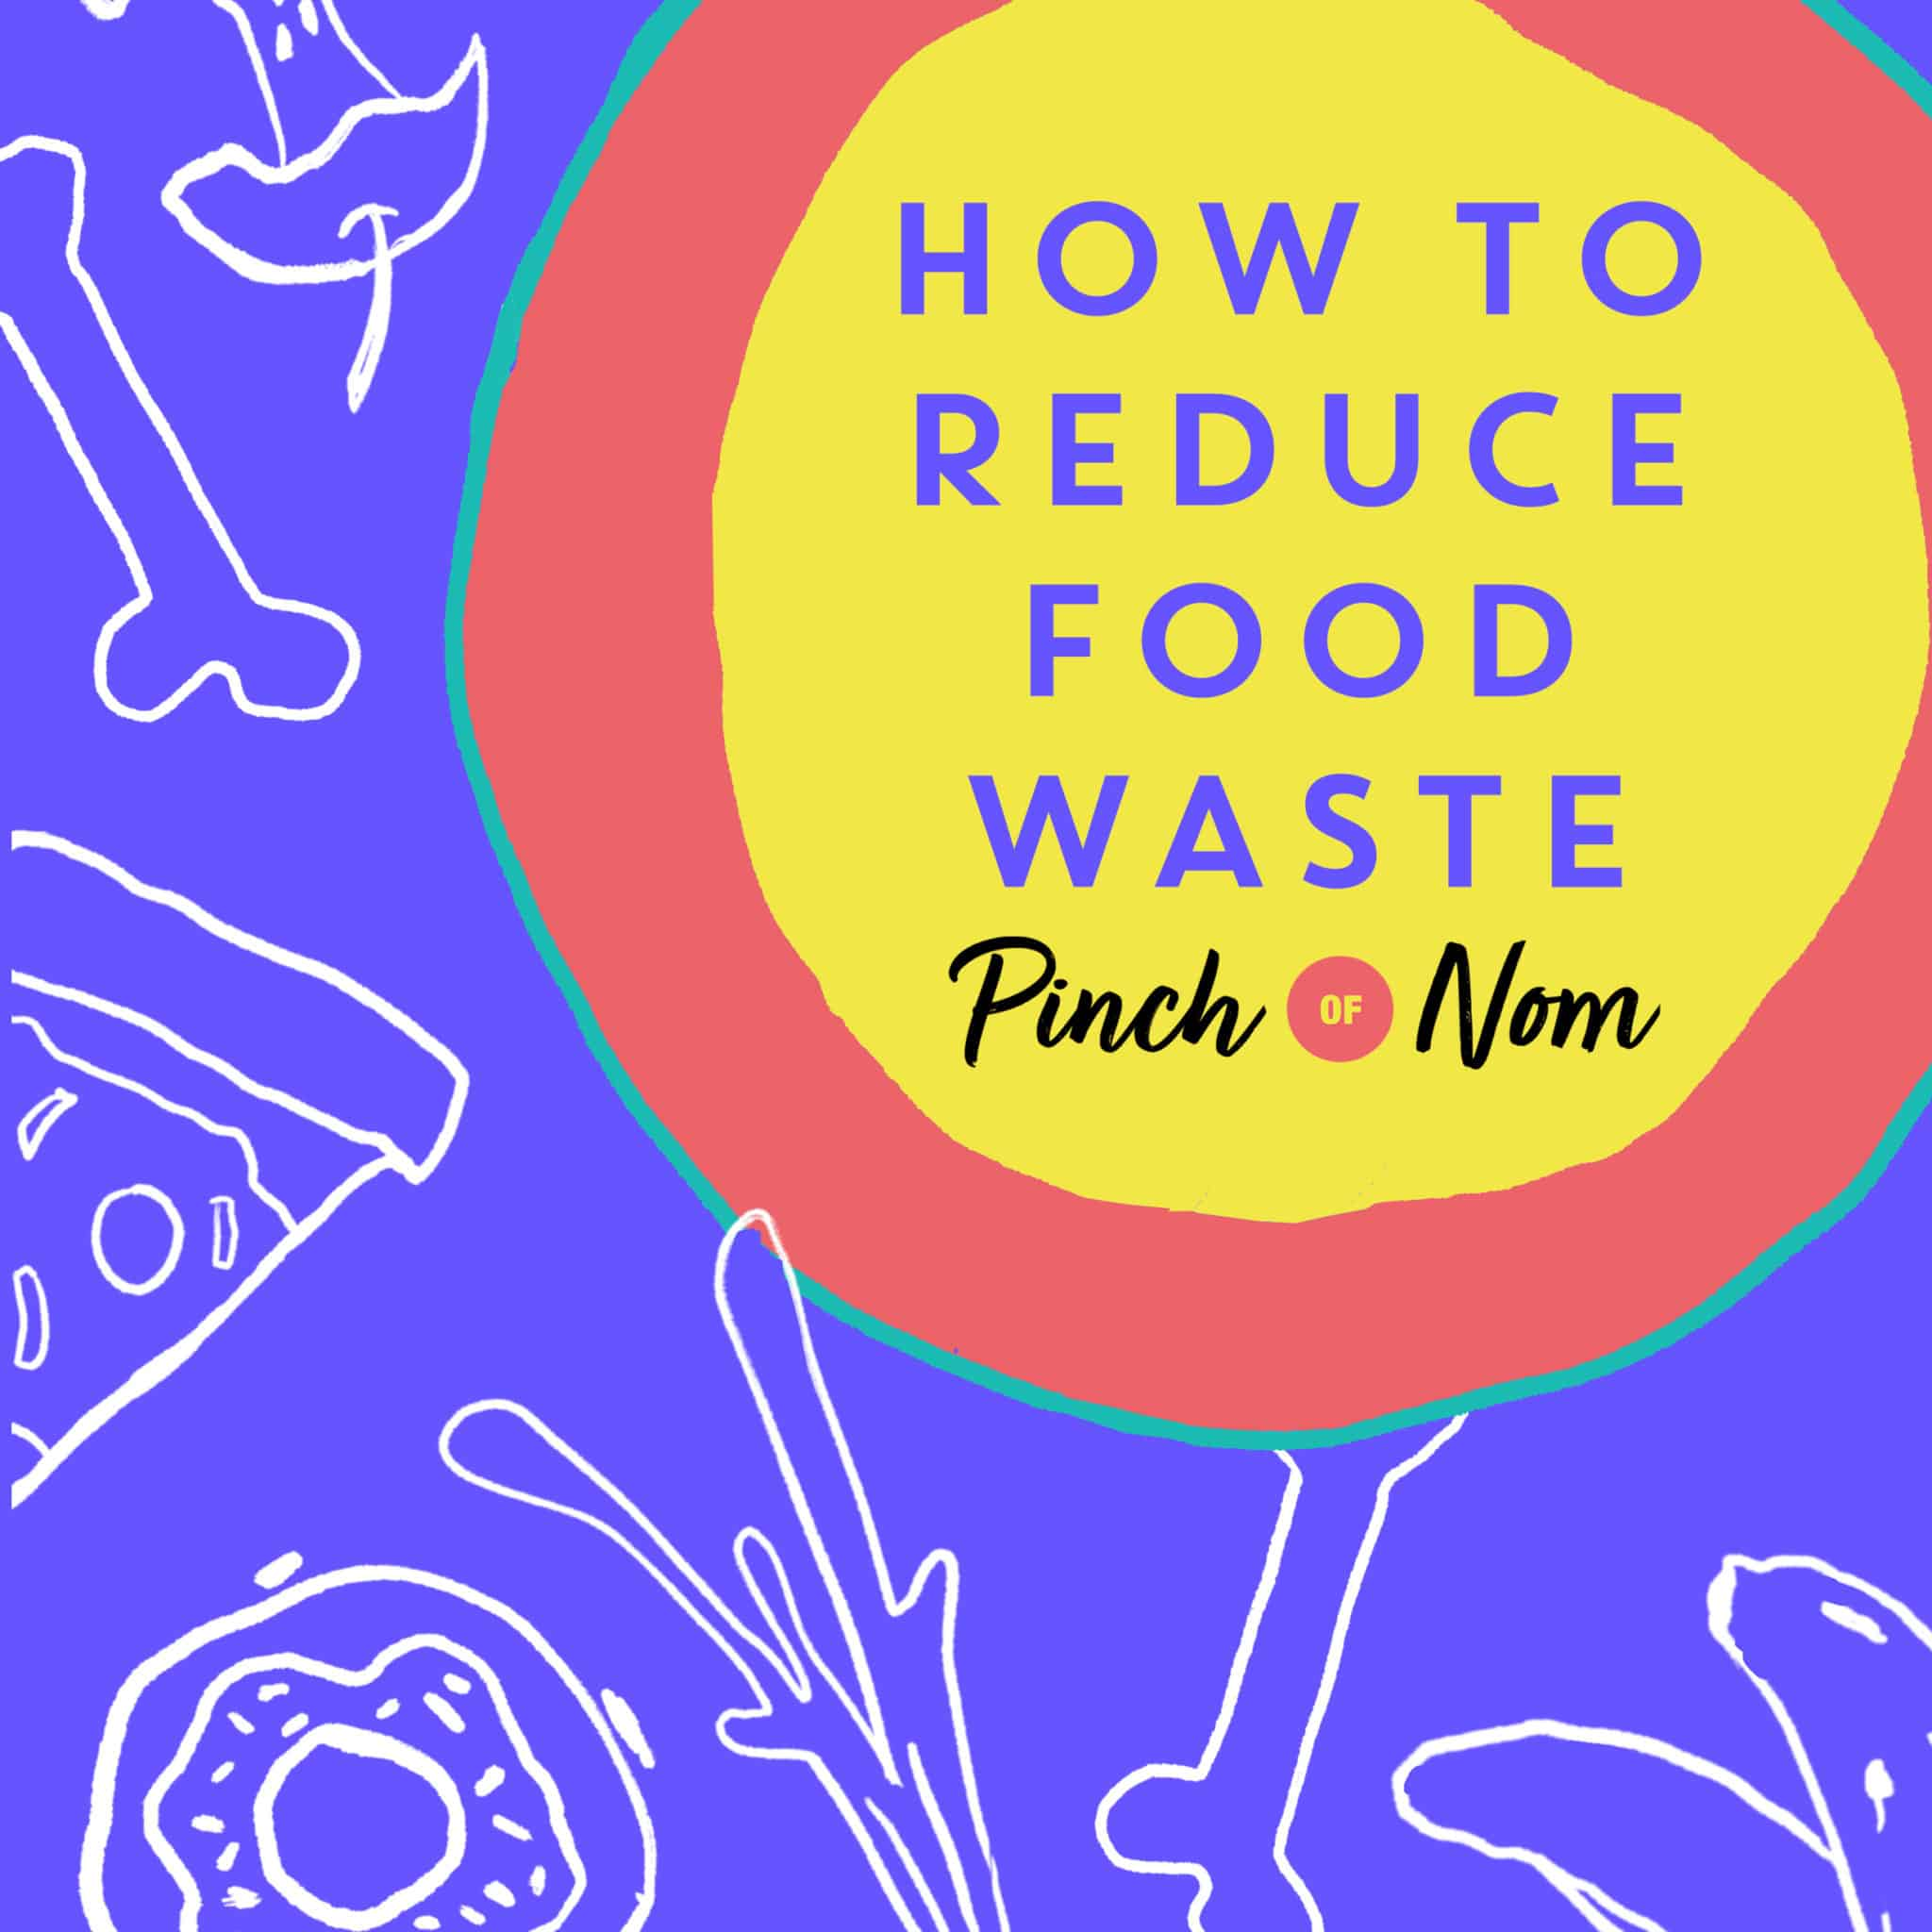 How to Reduce Food Waste pinchofnom.com